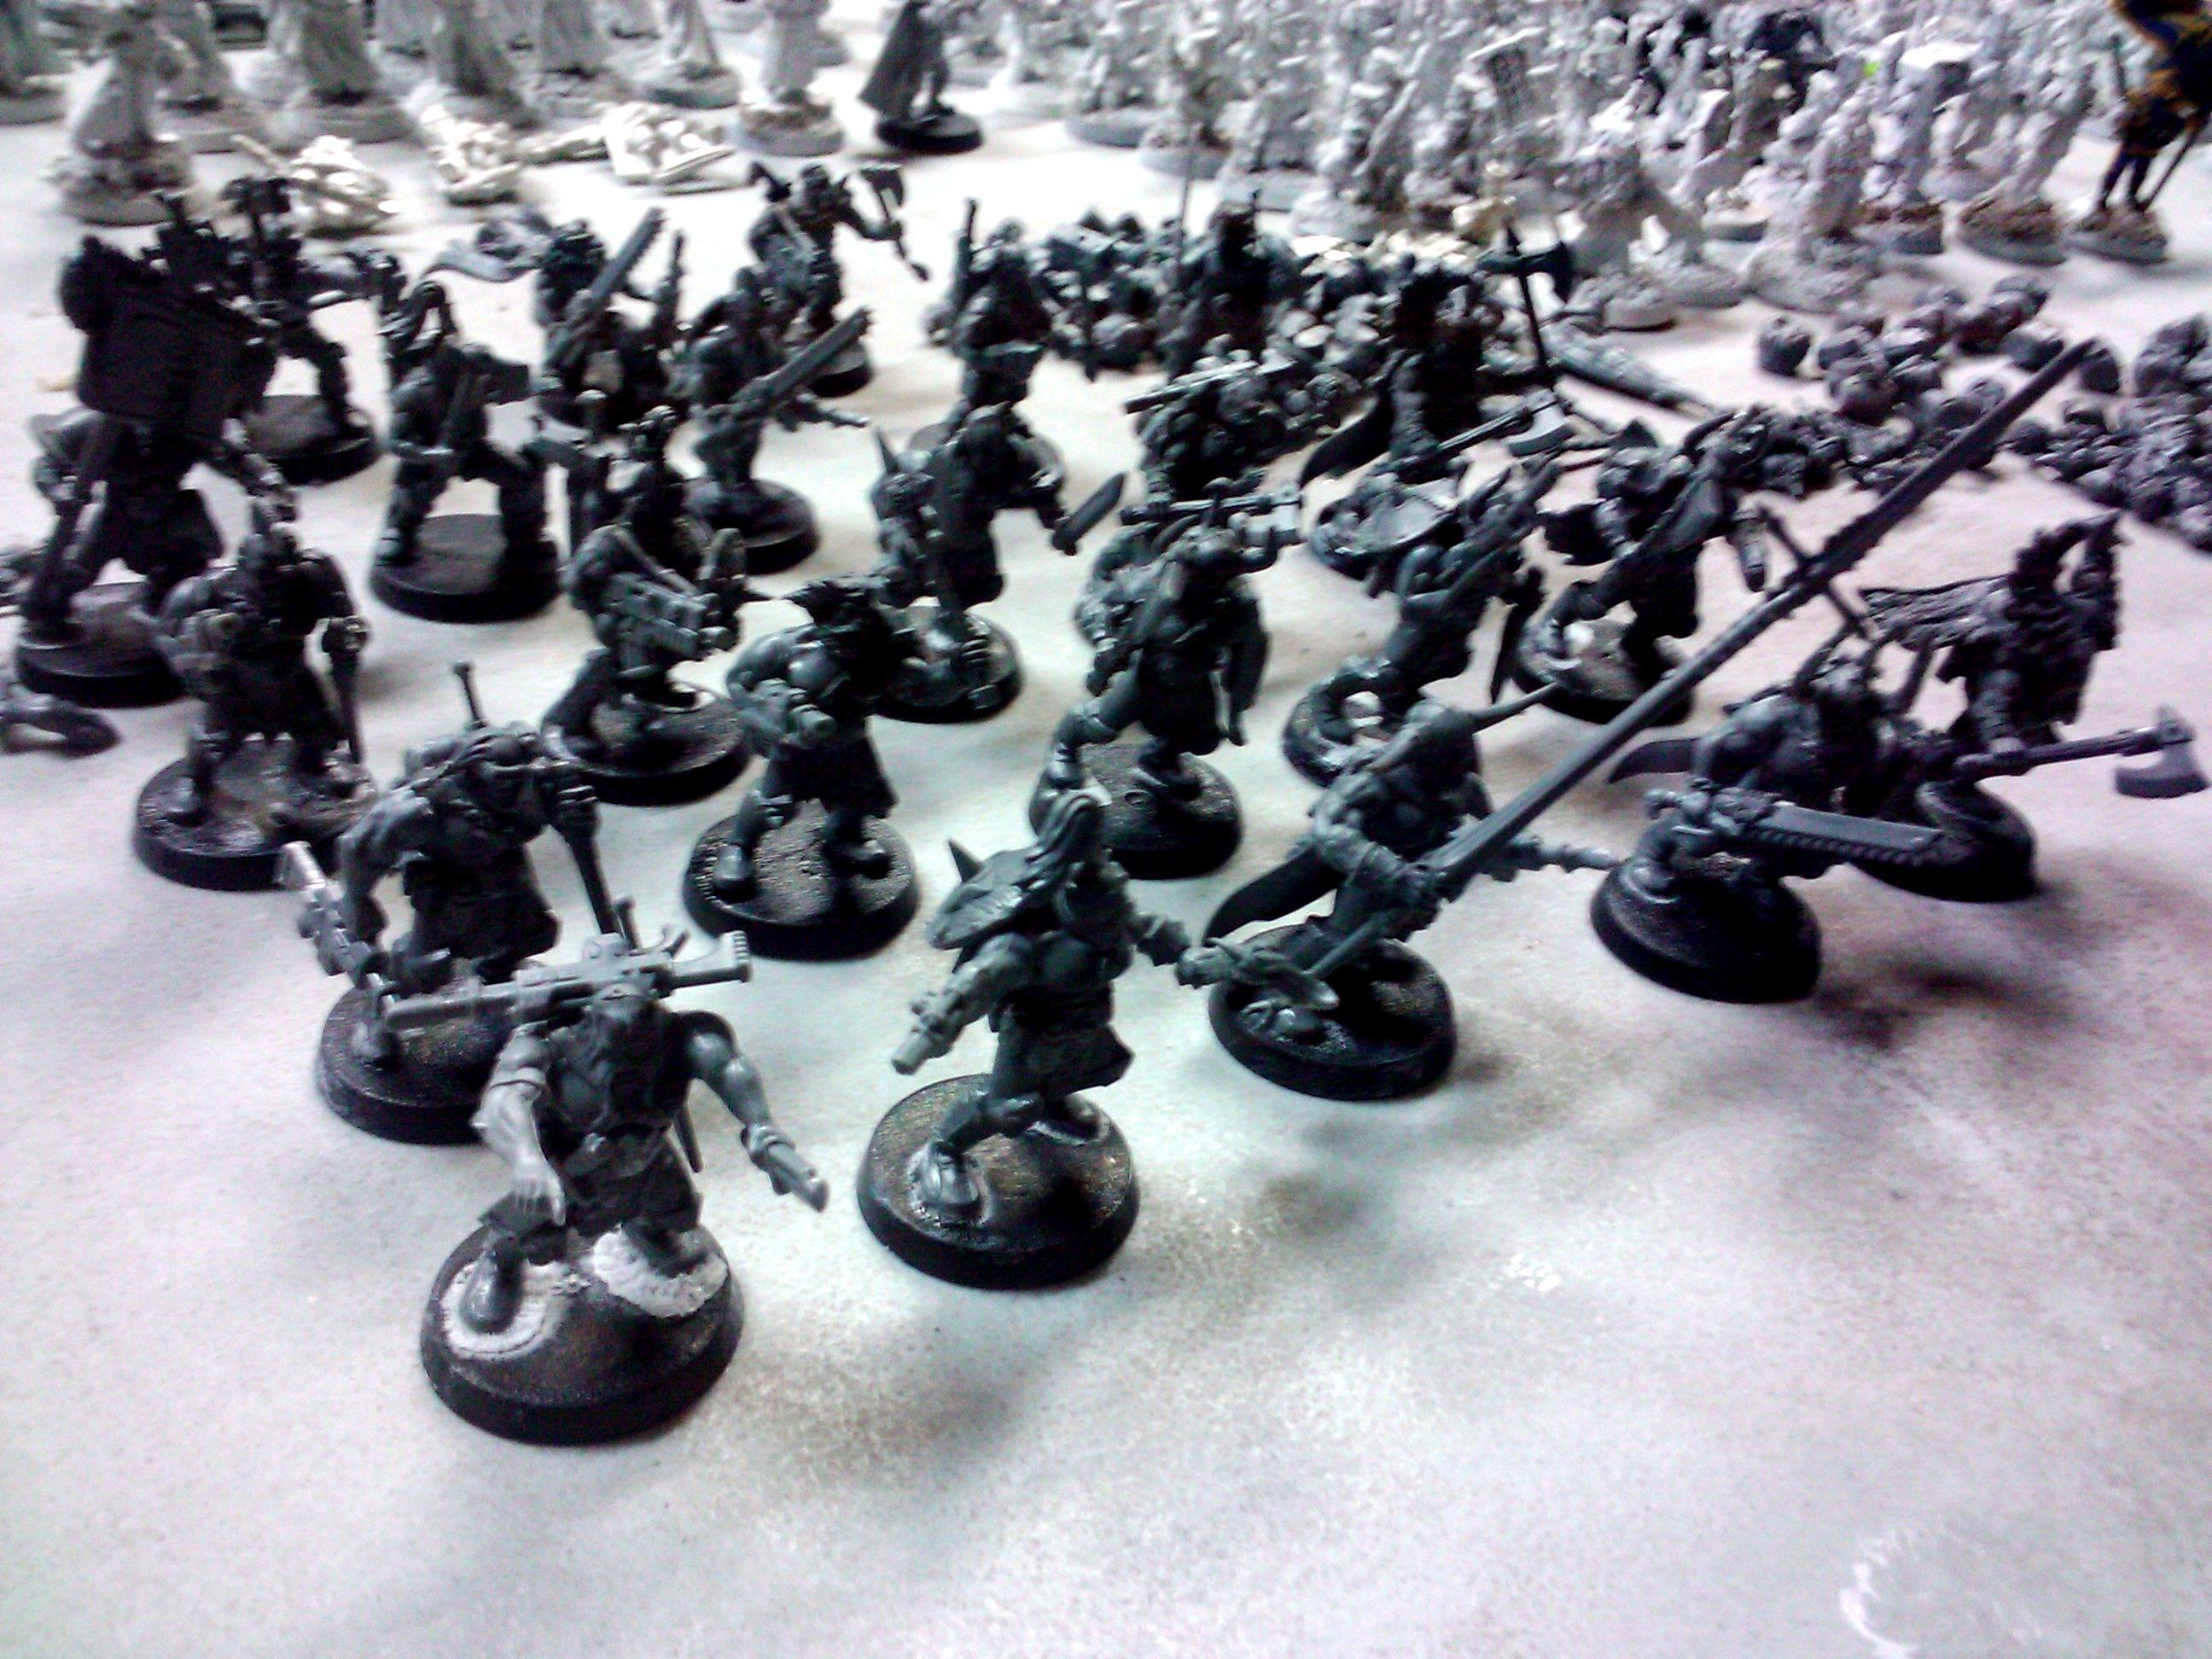 Bits, Cadians, Catachan, Chaos, Conversion, Fenris, Fluff, High Elves, Hobby Craft, Imperial Guard, Marauders, Marrauder, Space Wolves, Sw, Warhammer Fantasy